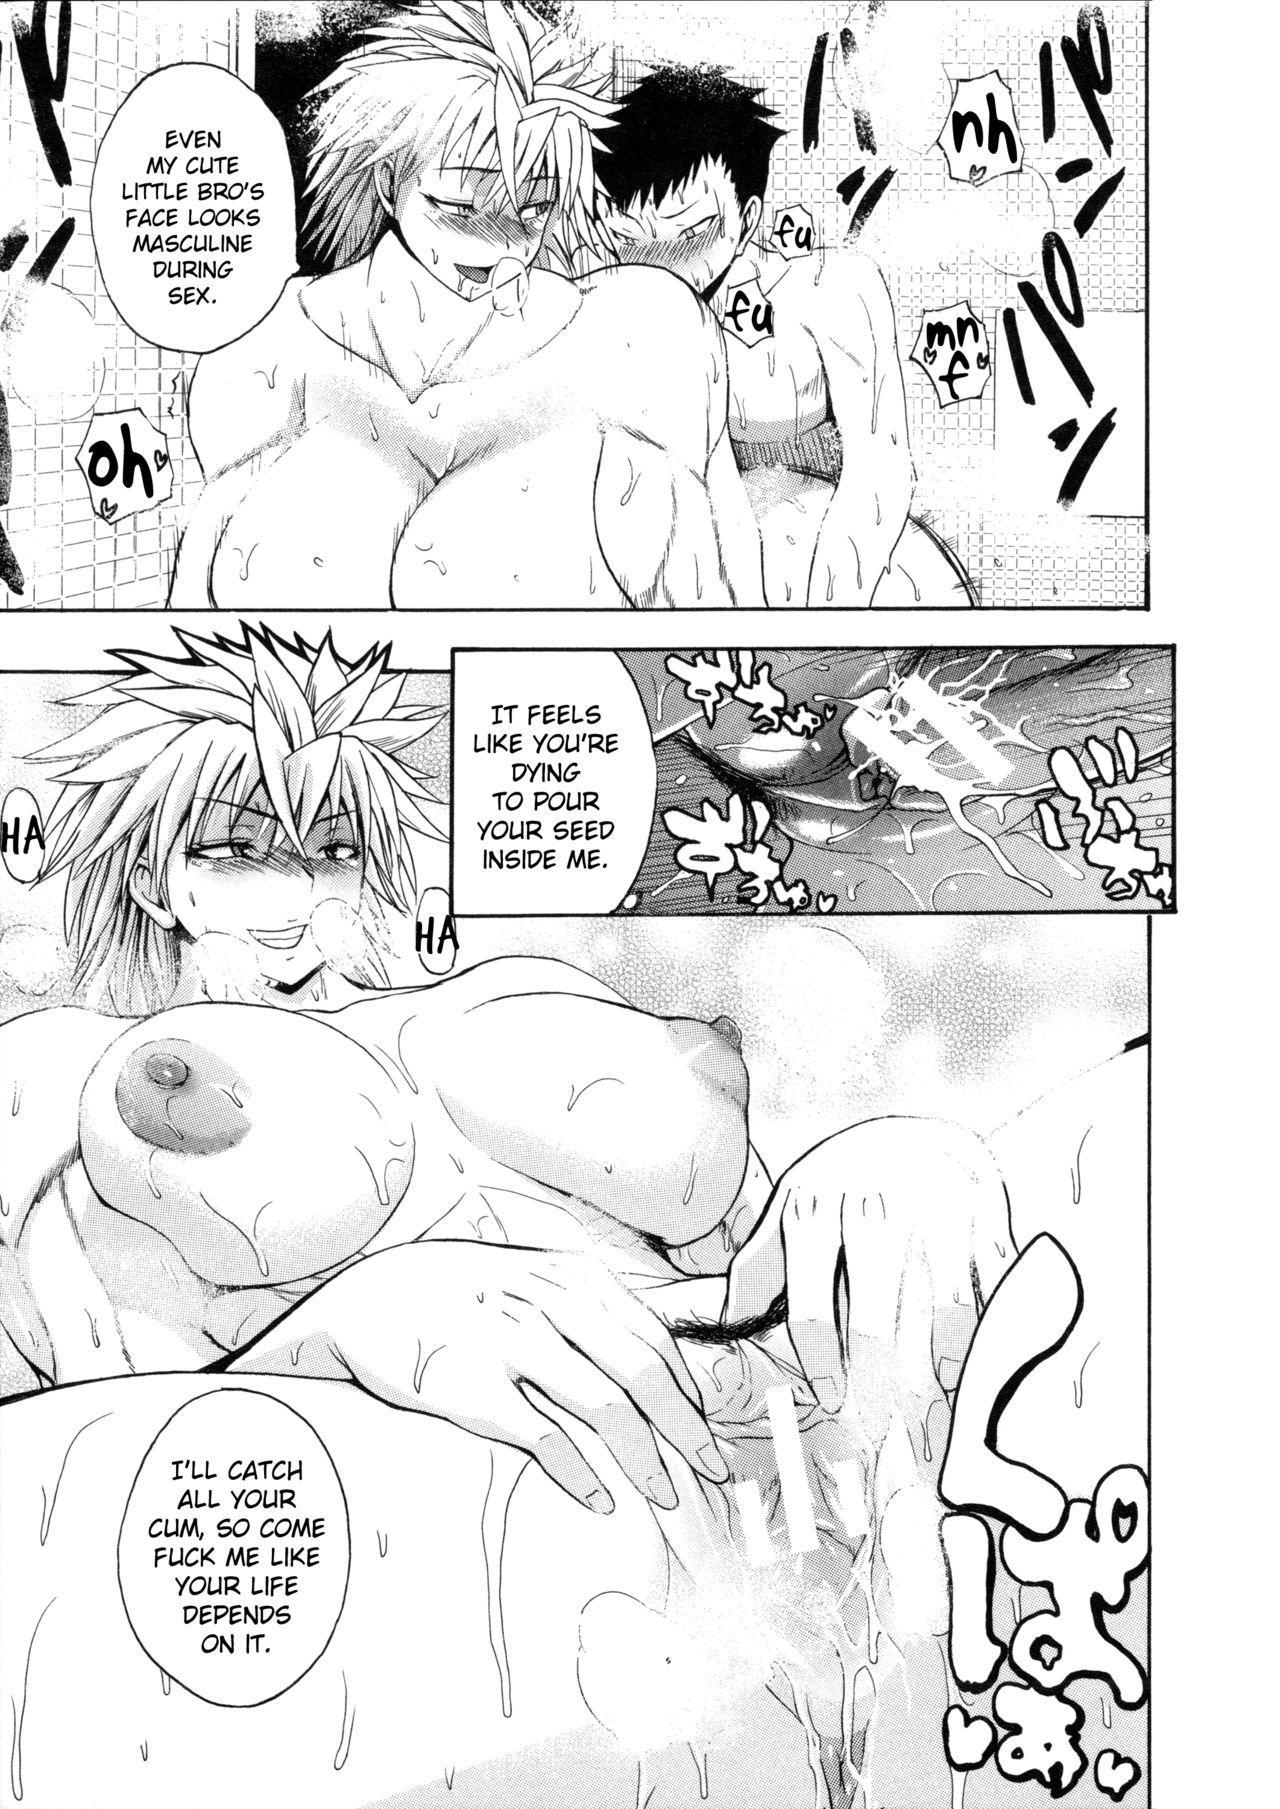 [Yoshimura Tatsumaki] Monzetsu Taigatame ~Count 3 de Ikasete Ageru~ | Faint in Agony Bodylock ~I'll make you cum on the count of 3~ [English] [Brolen] 145